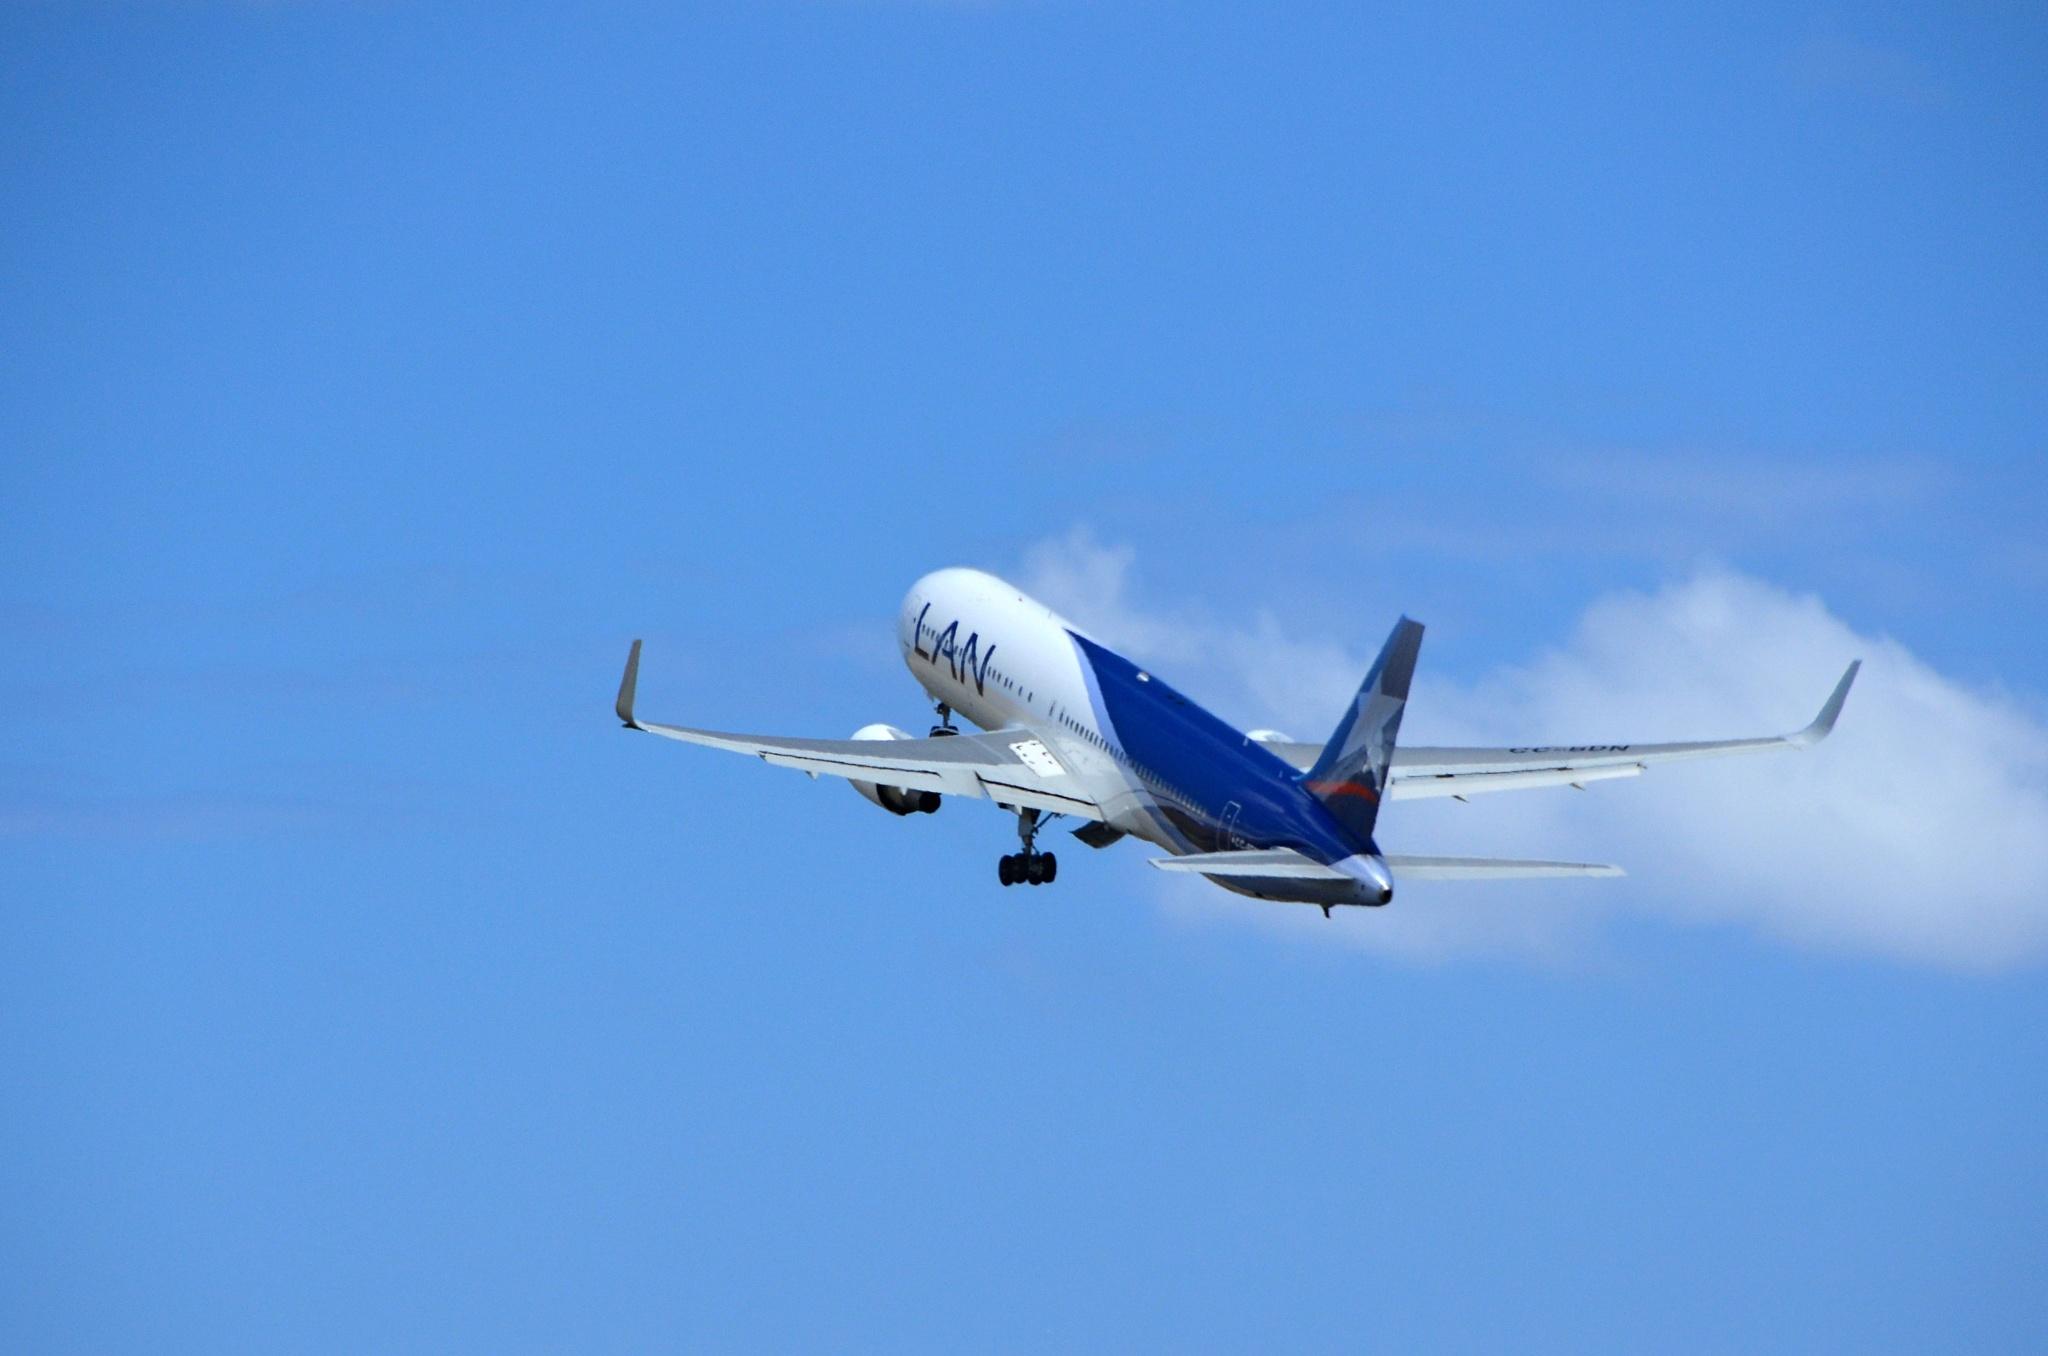 A letadlo už je fuč...